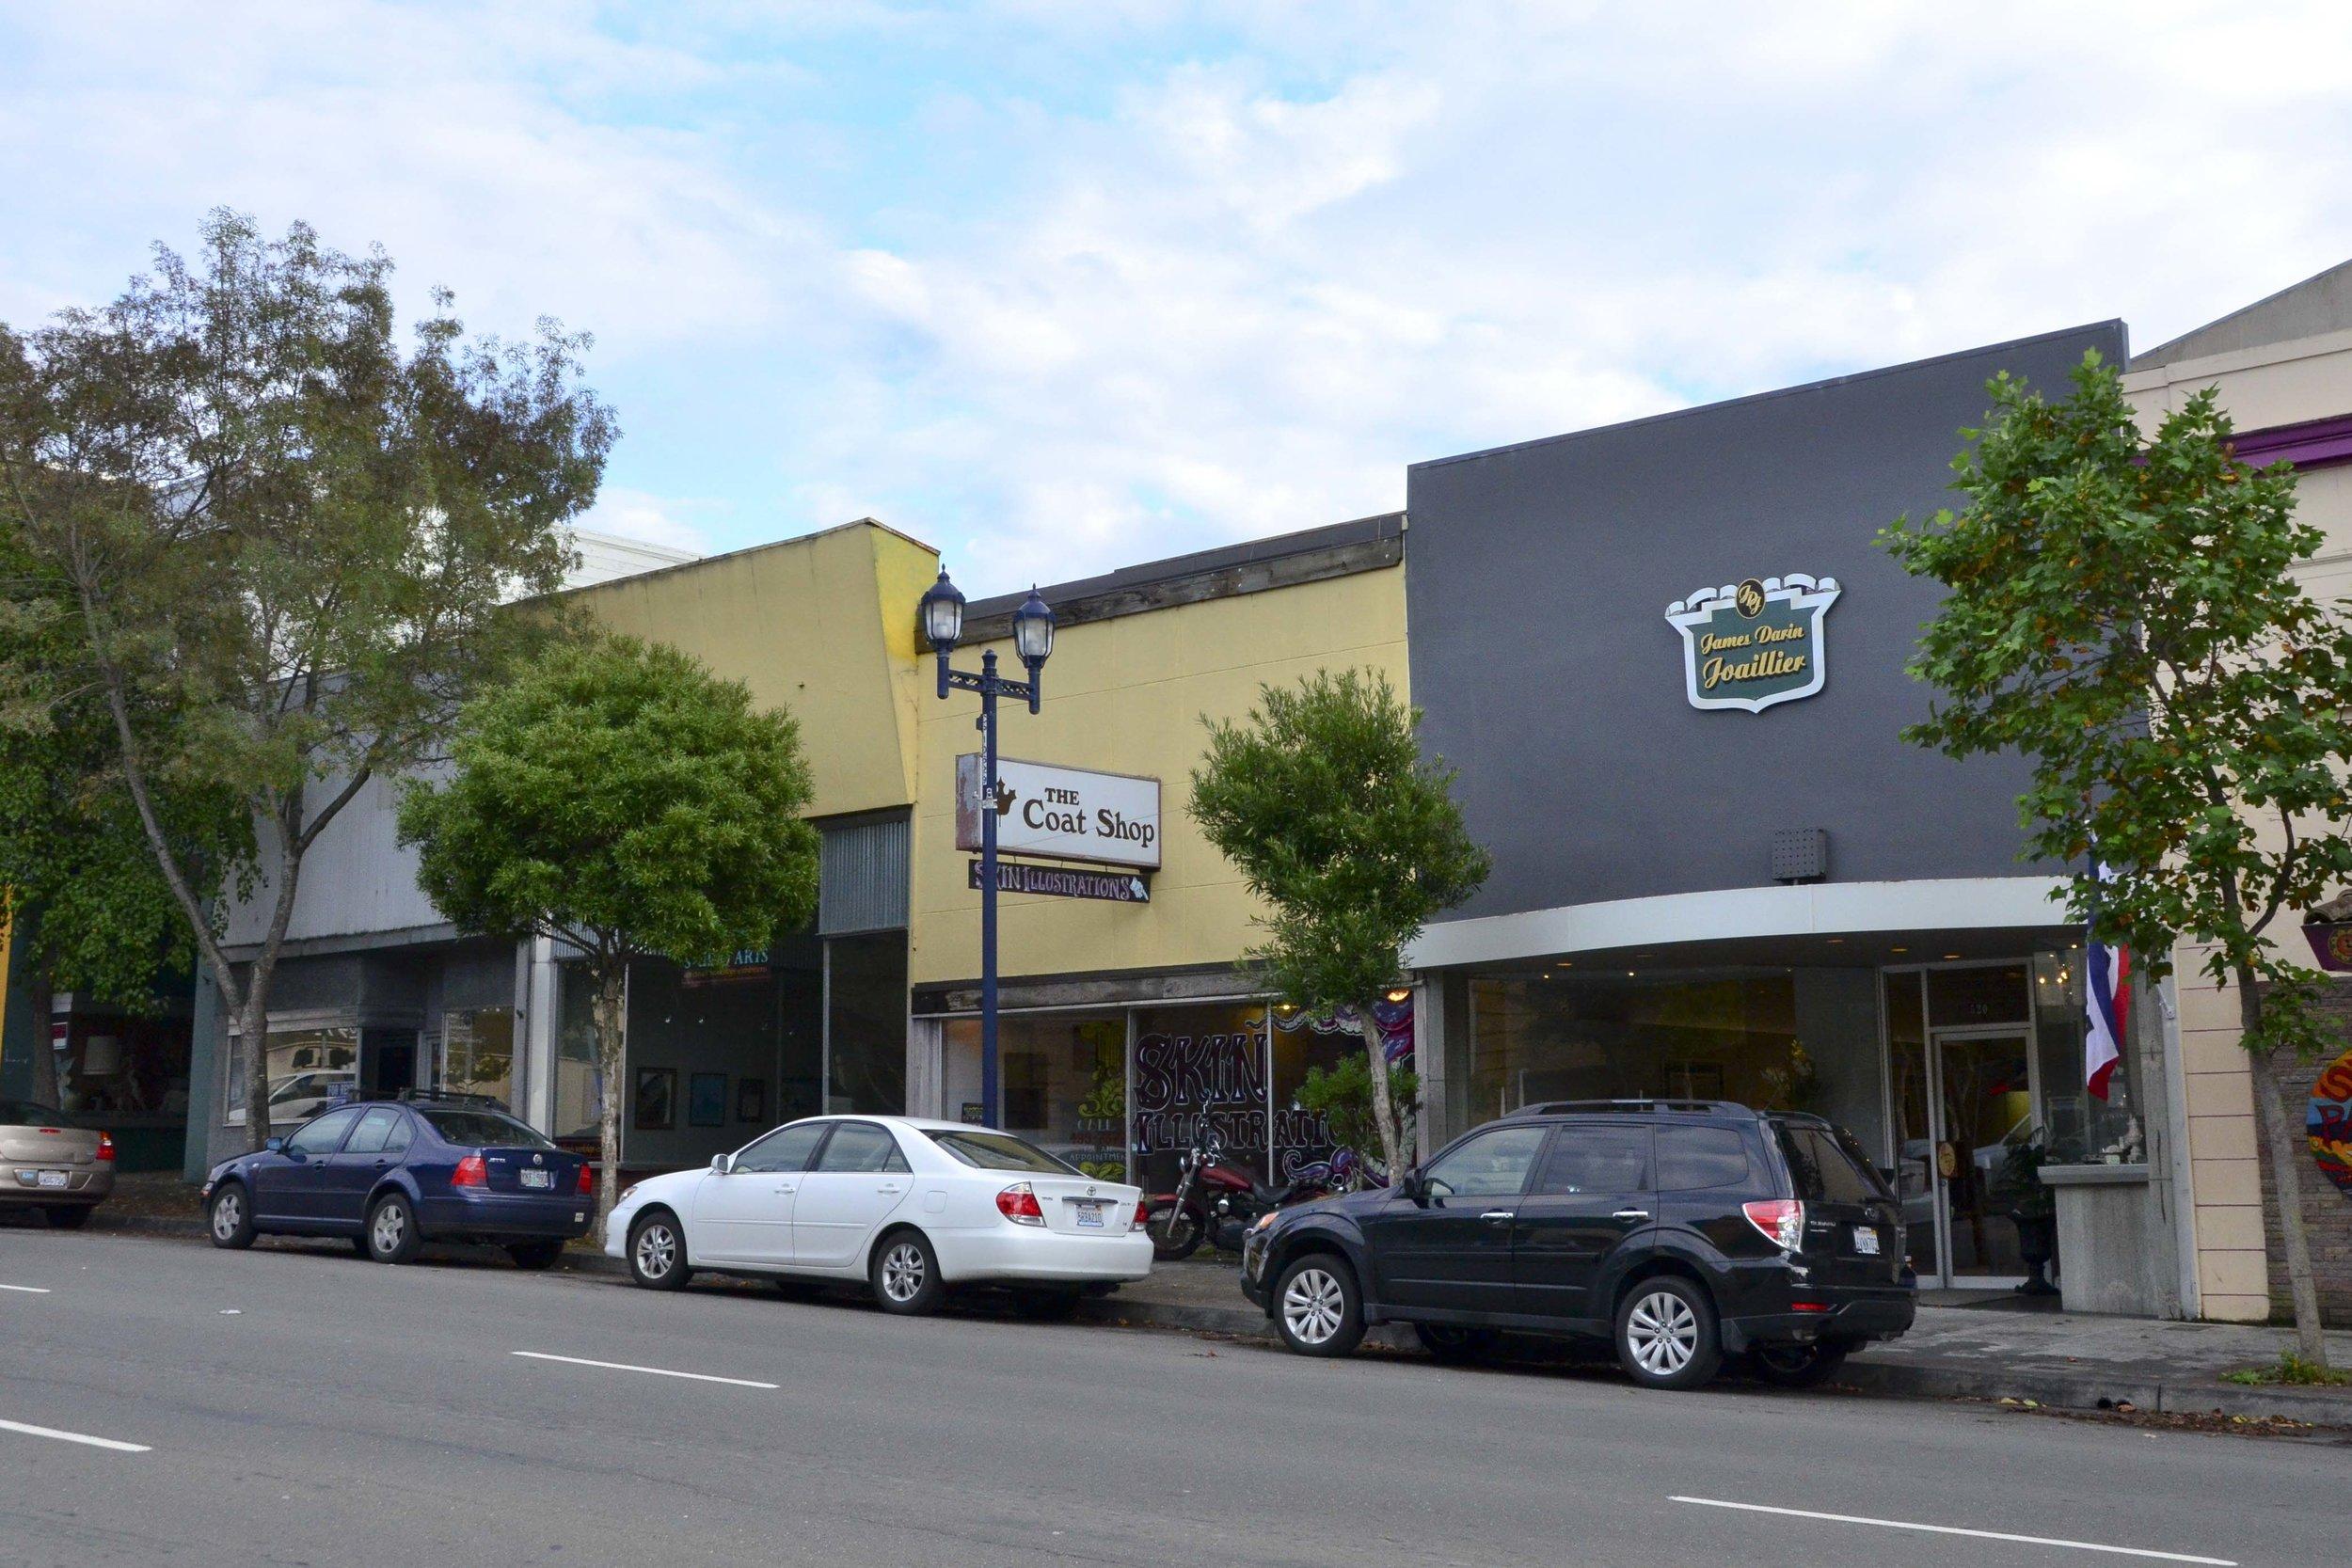 Humboldt Bay Social Club Downtown Eureka Vacation Rental